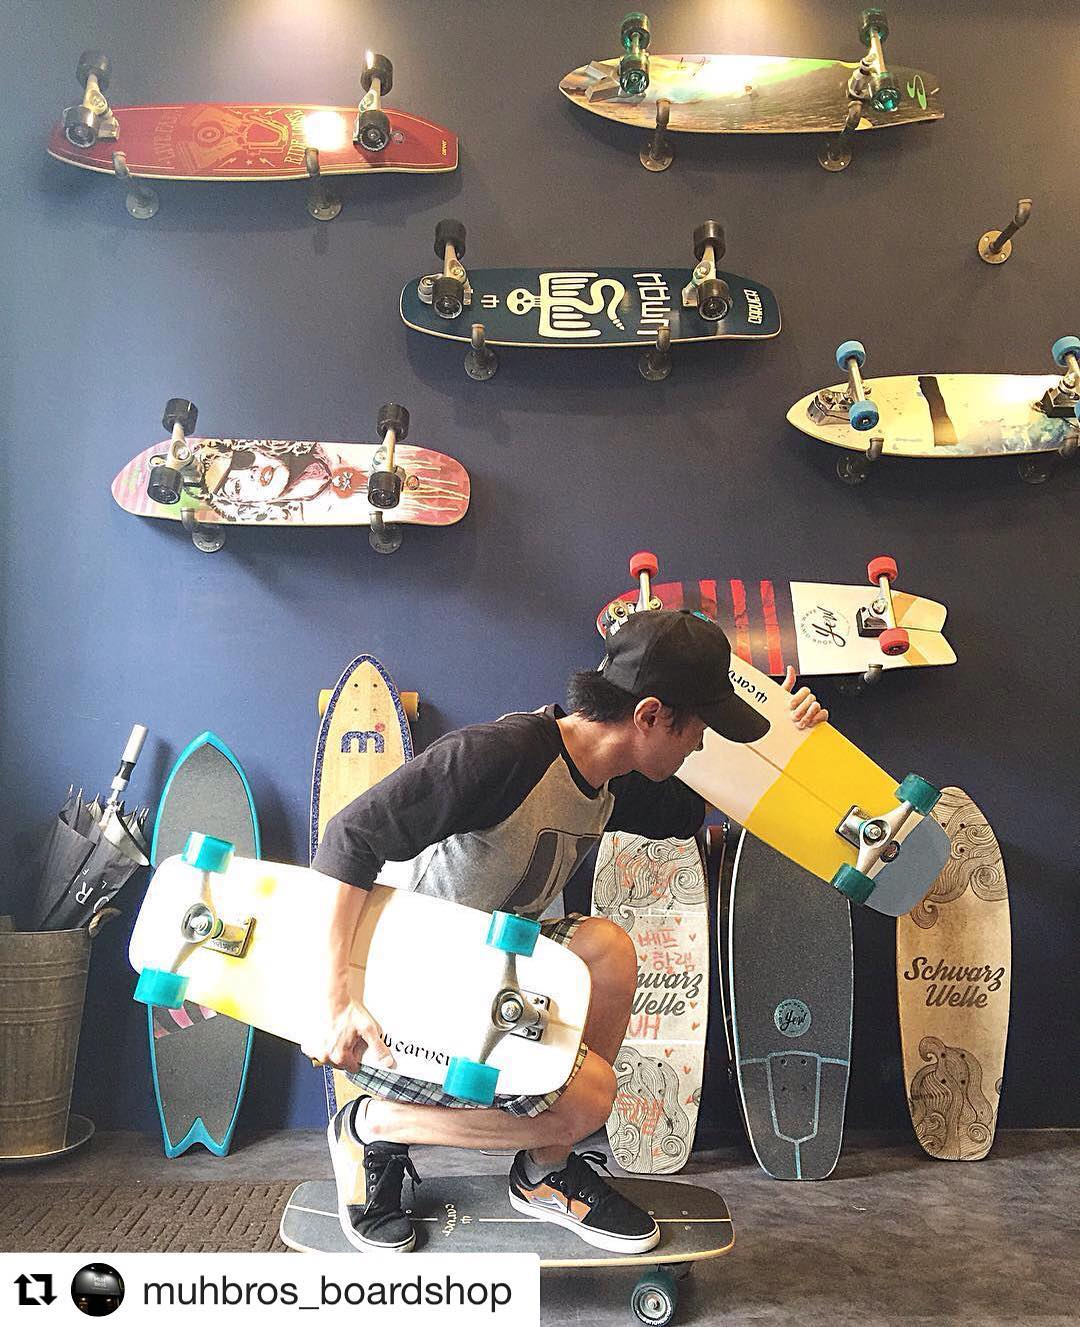 #Repost @muhbros_boardshop (via @repostapp) ・・・ MINI SIMS HOLIC . . #카버 #카버보드 #서프스케이트 #랜드서핑 #운스타그램 #보드타그램 #보드스타그램 #보드 #촬영 #양재천 #영동1교 #영동교오빠들 #무브로스 #무브로스보드샵 #carver #carverskateboards #carverskate #landsurfing #daily #board #skateboard #muhbros...